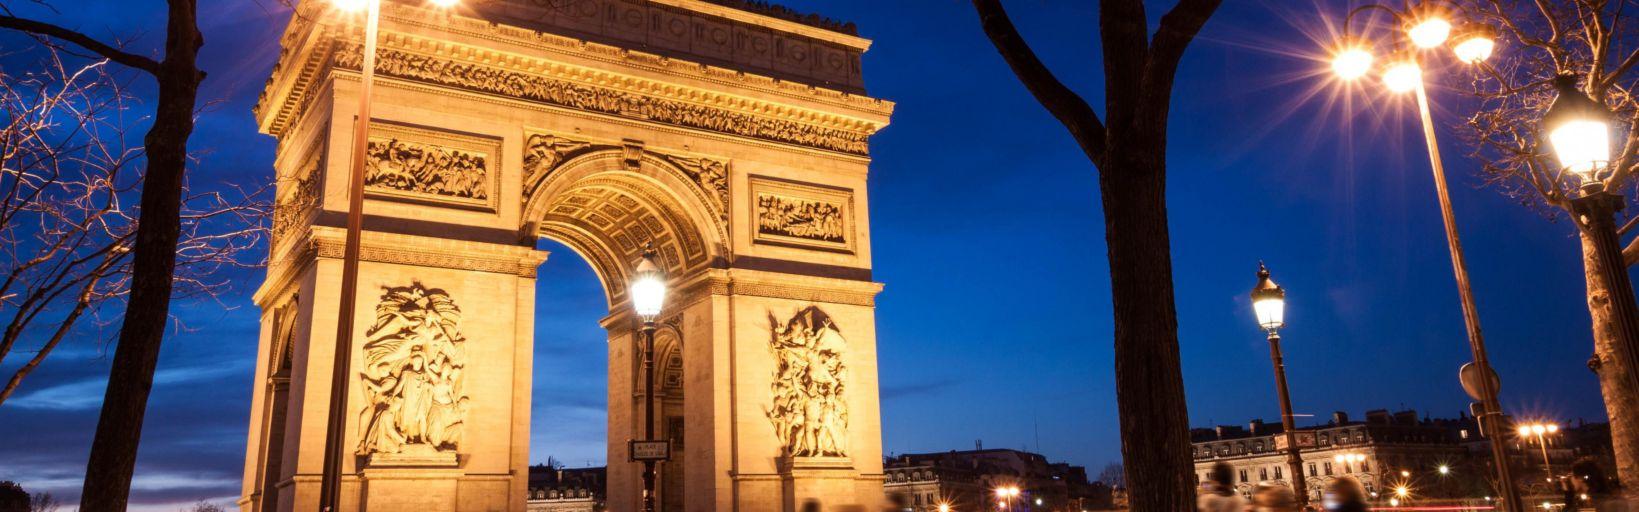 North Paris Hotels Holiday Inn Paris Porte De Clichy